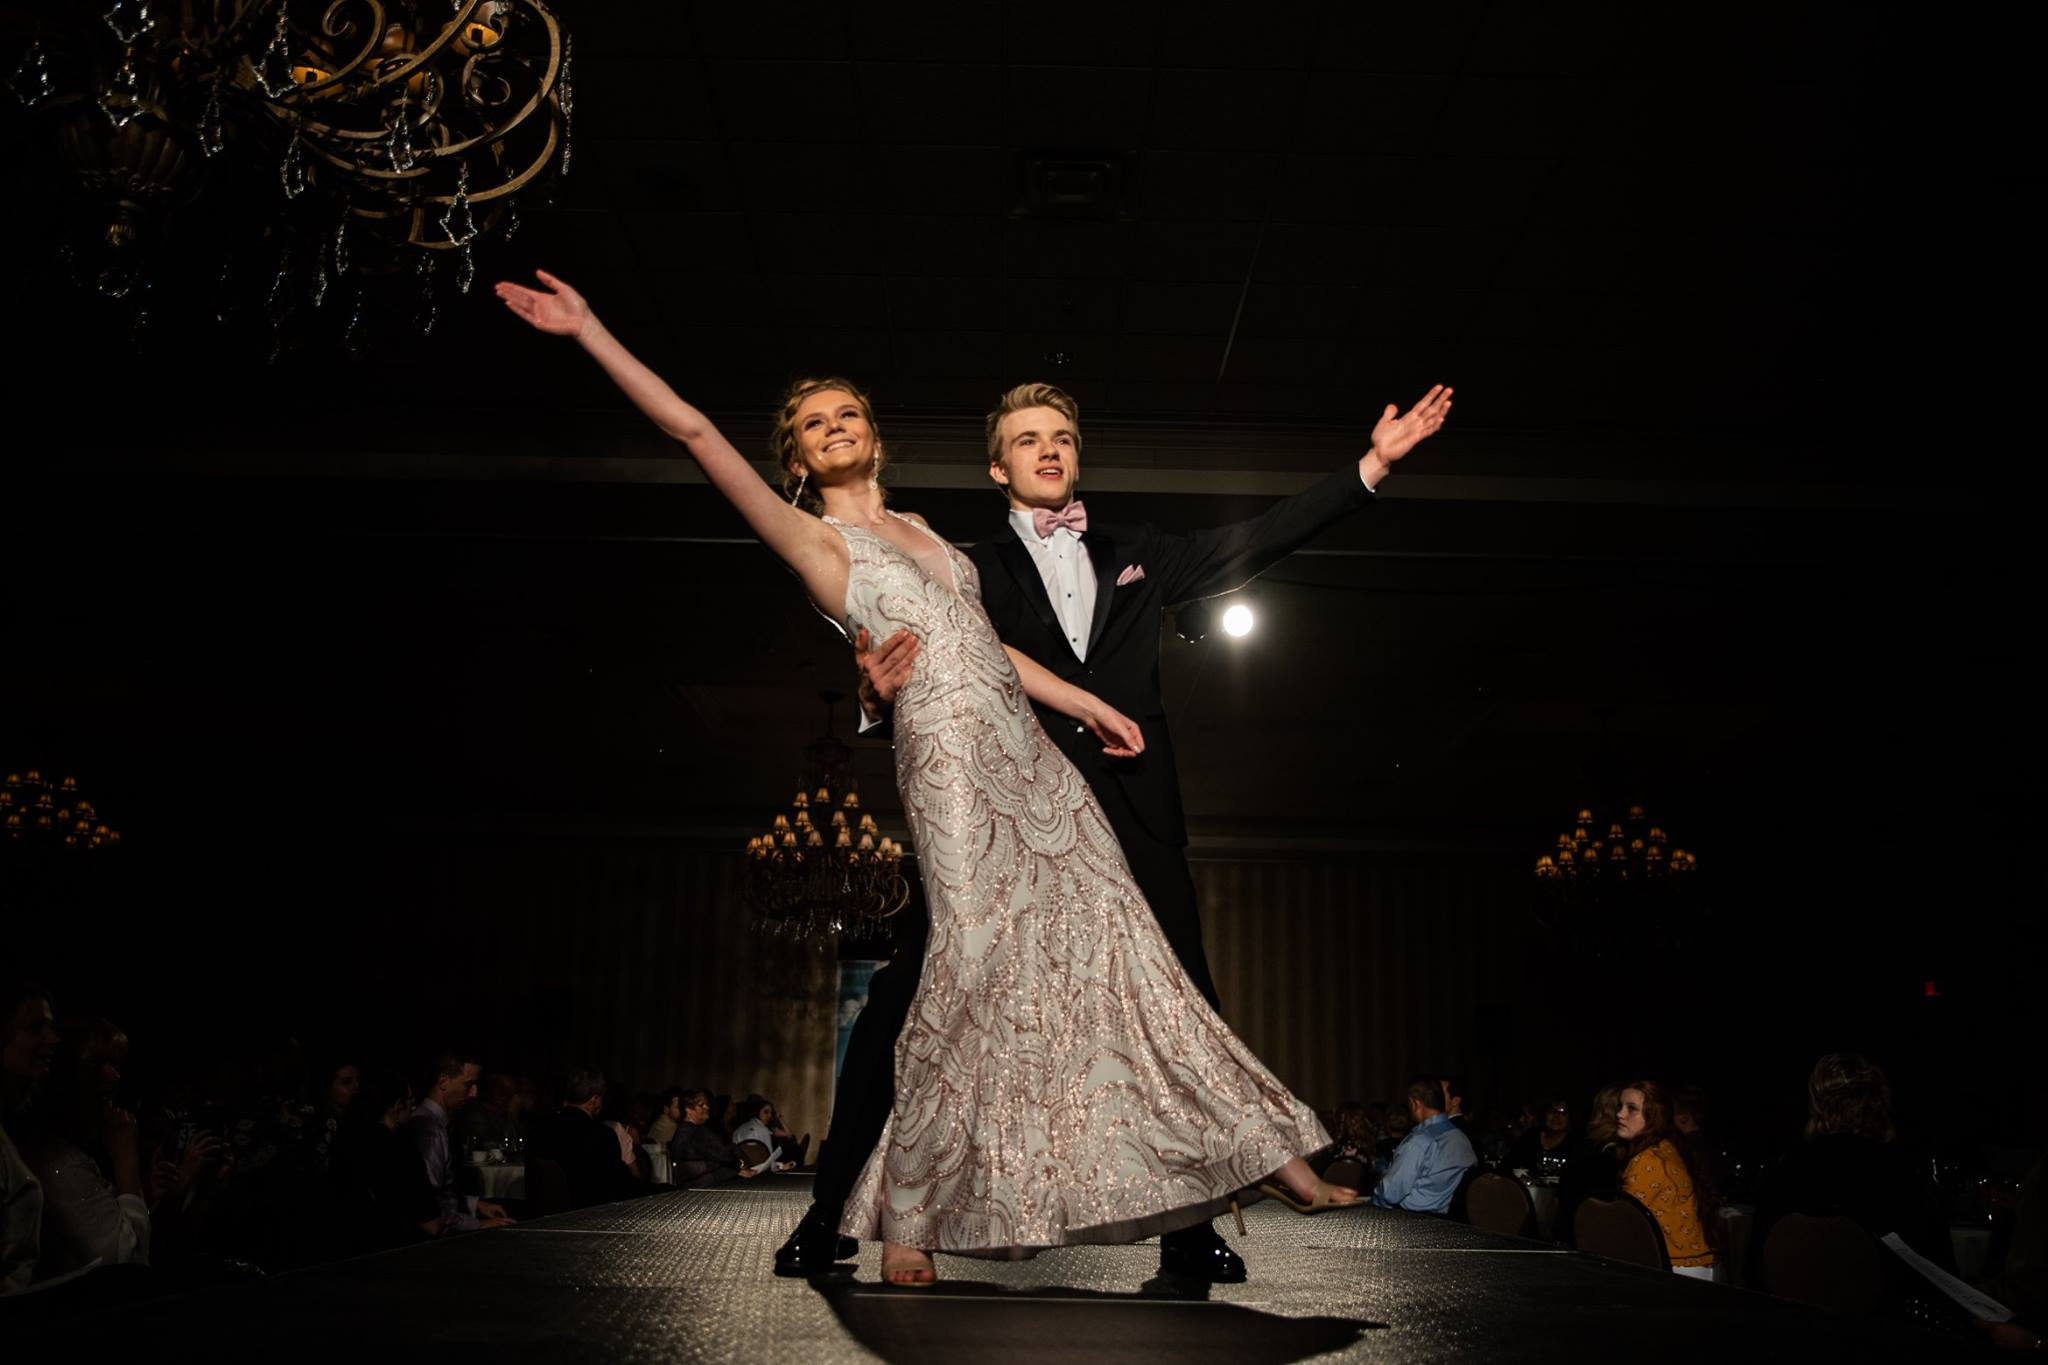 Lutheran_North_High_School_Macomb_Michigan_LHN_Fashion_Show_2019_Seniors (77).jpg